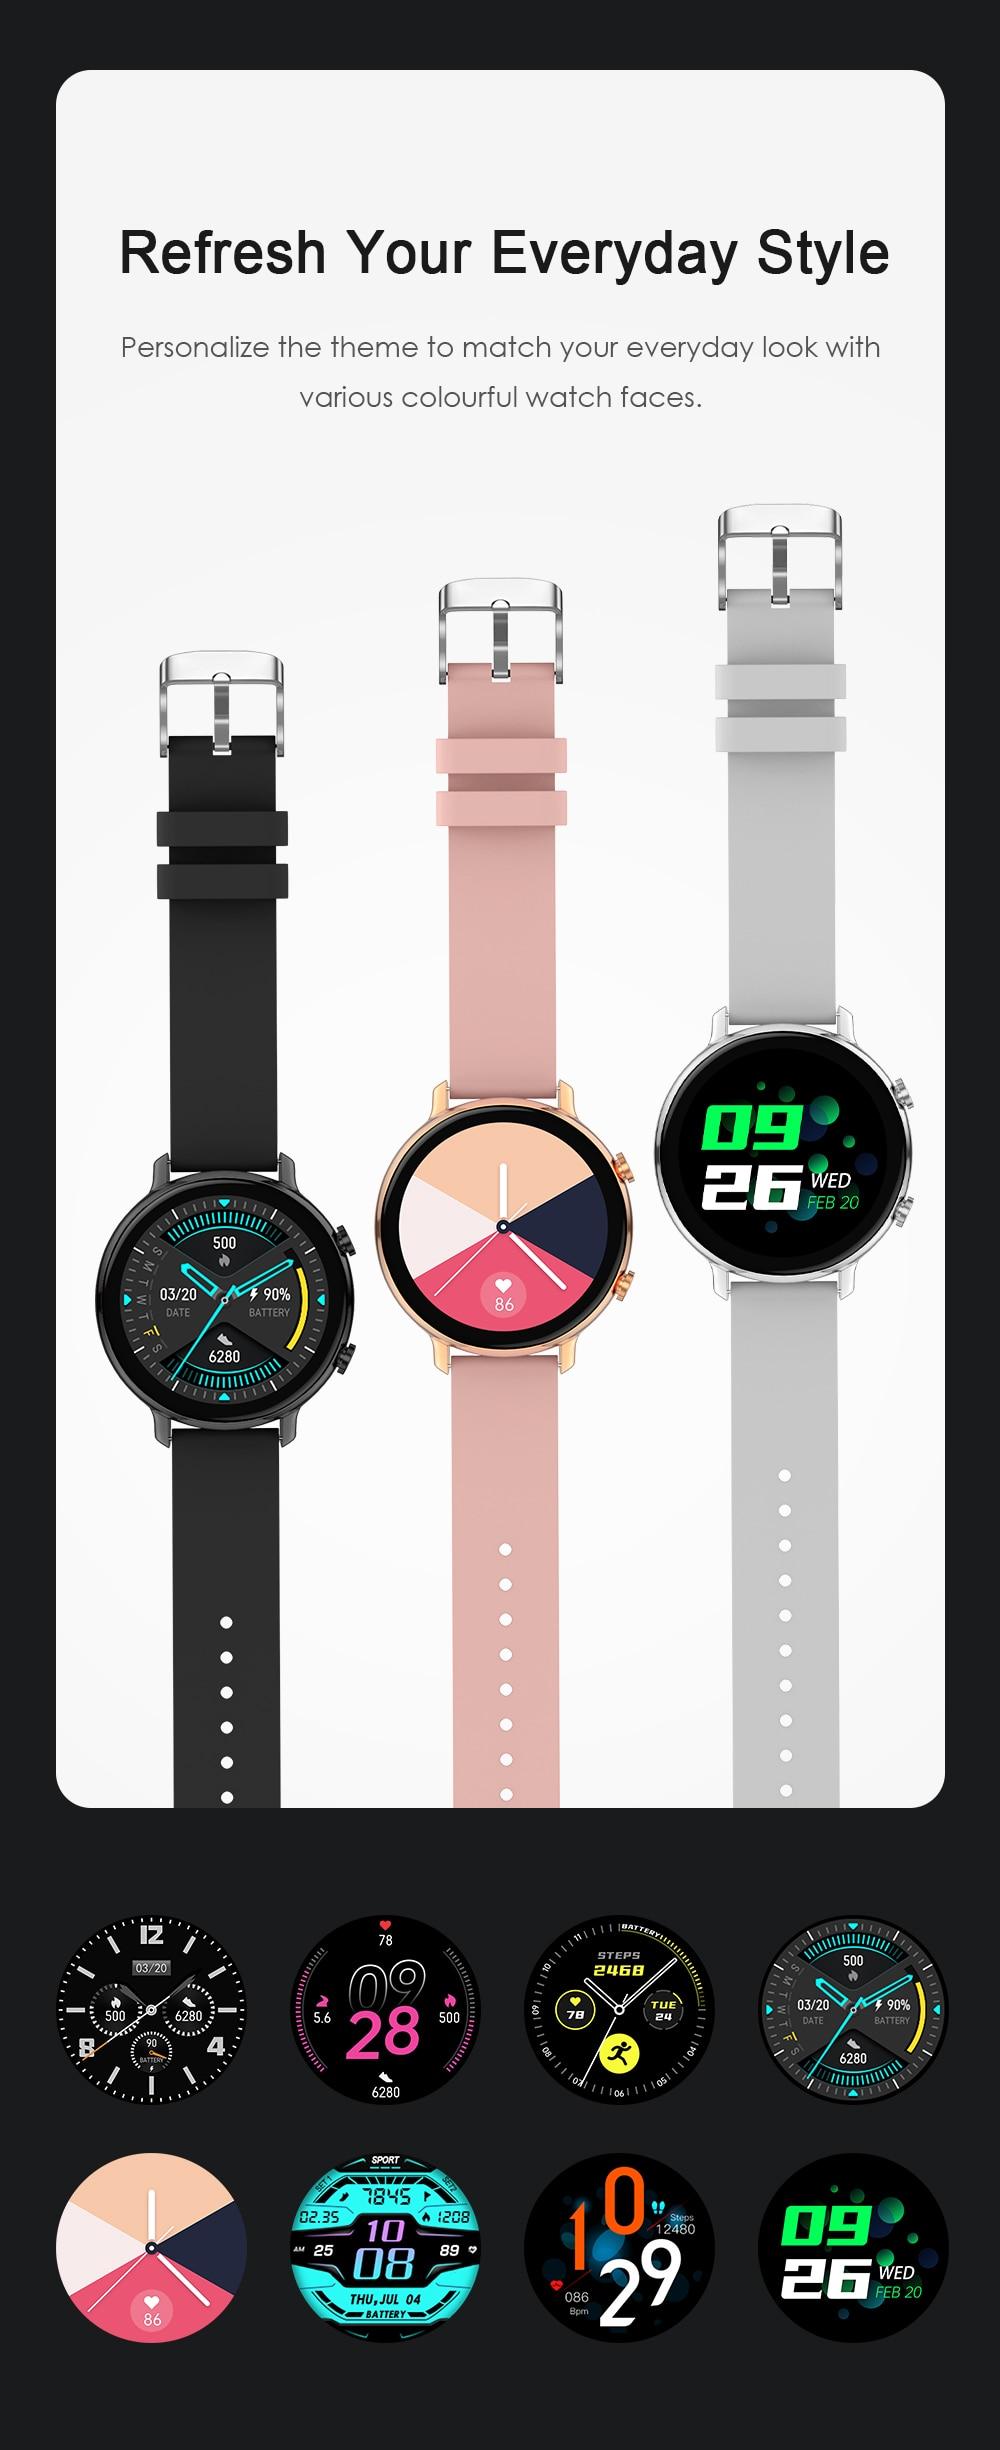 H05b167920cac4e79885c1dd466d8bb1bj SANLEPUS 2021 Smart Watch Dial Calls Men Women Waterproof Smartwatch ECG PPG Fitness Bracelet Band For Android Apple Xiaomi